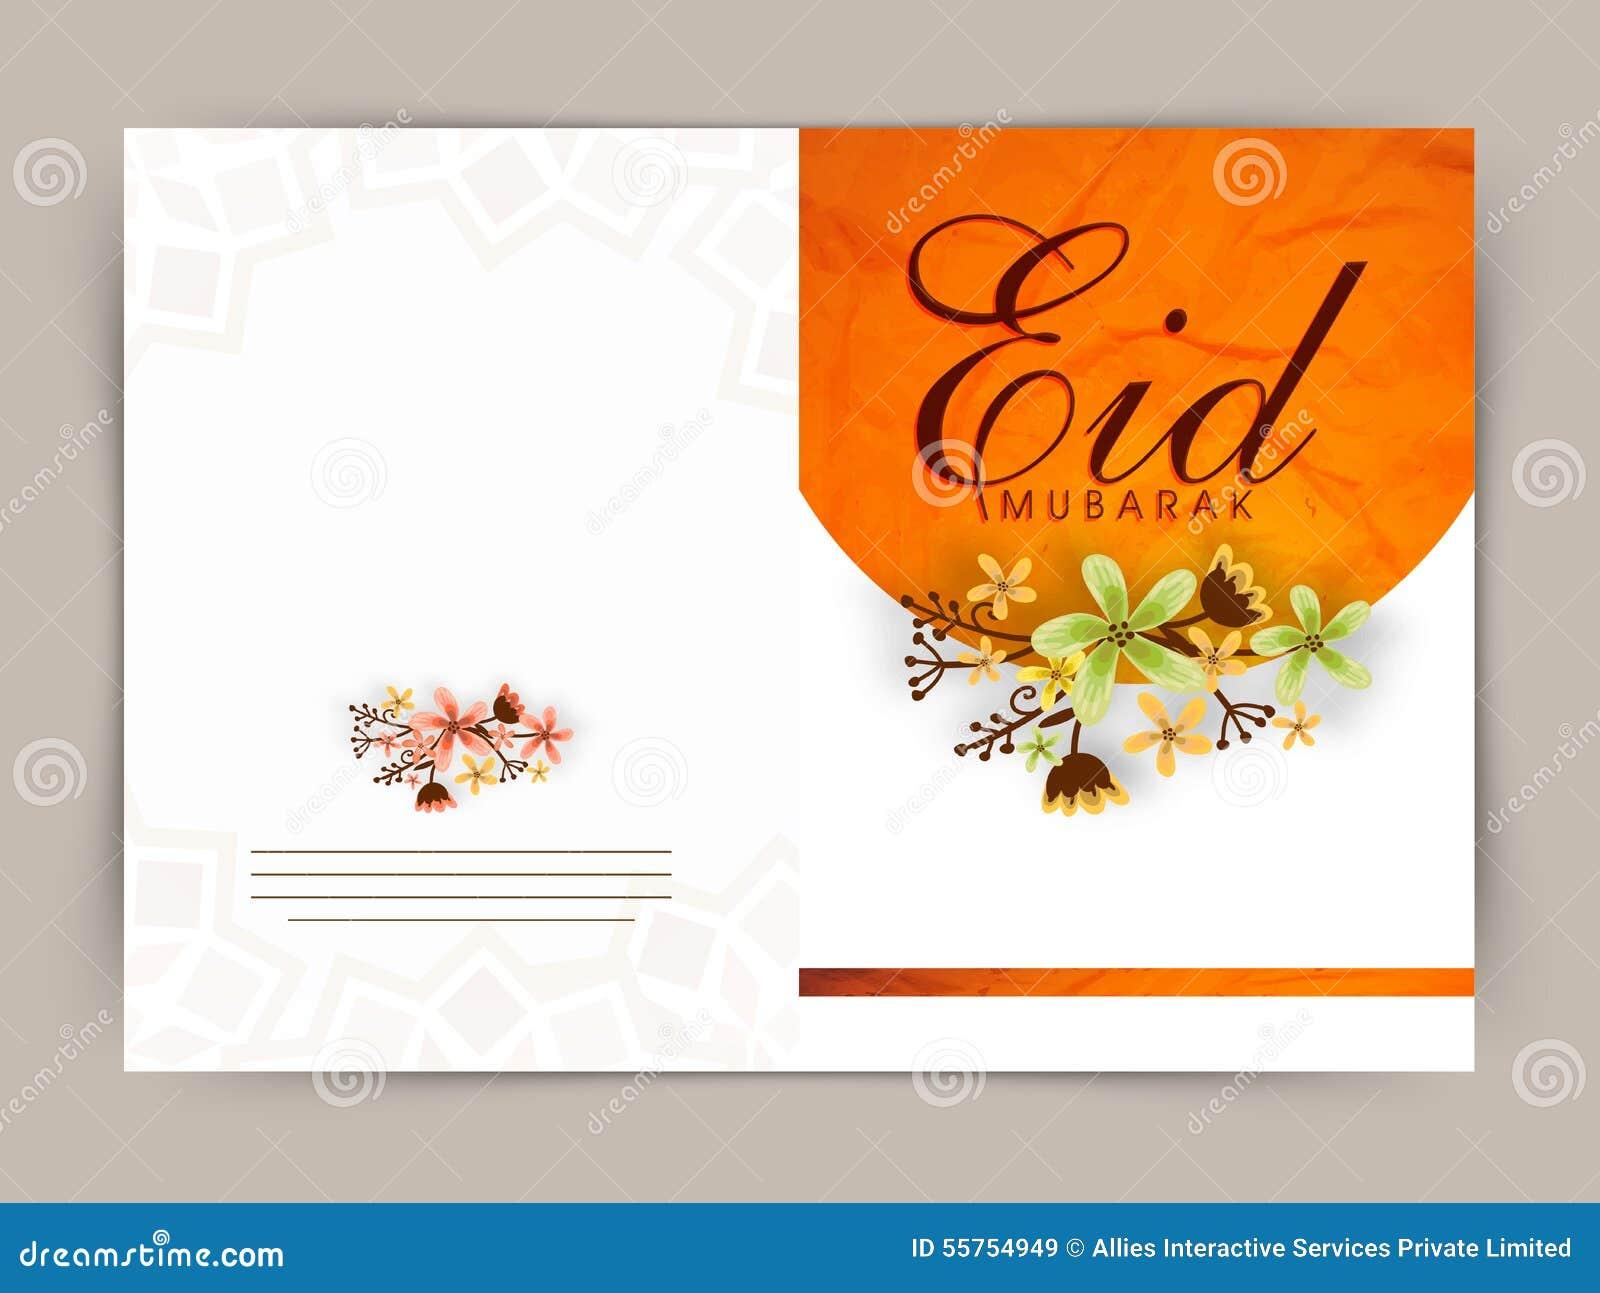 Card Ideas For Eid Greetings Easy Diy Eid Card